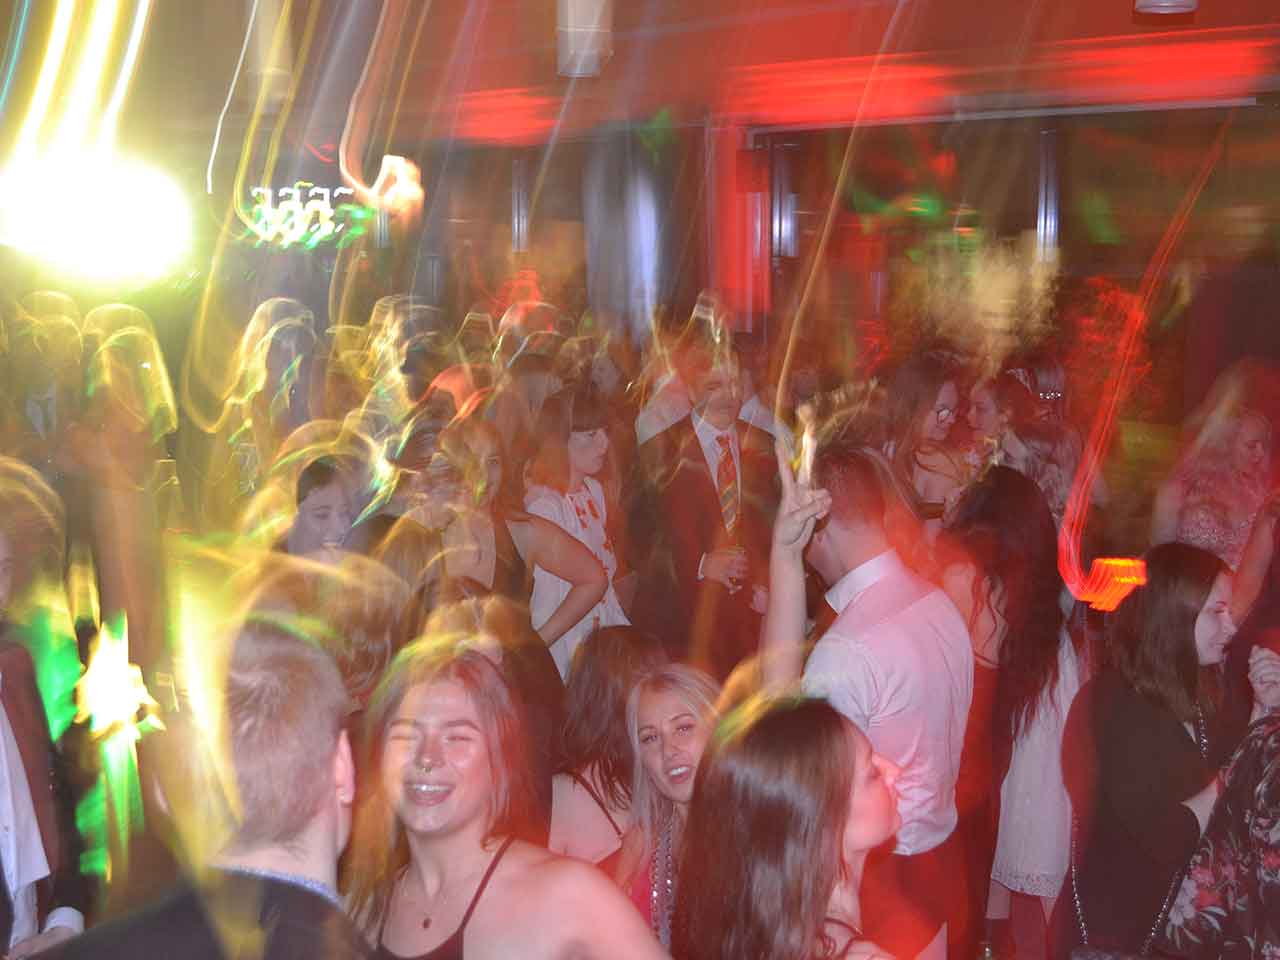 Brazilia Festlokal - dans och möjlighet scen